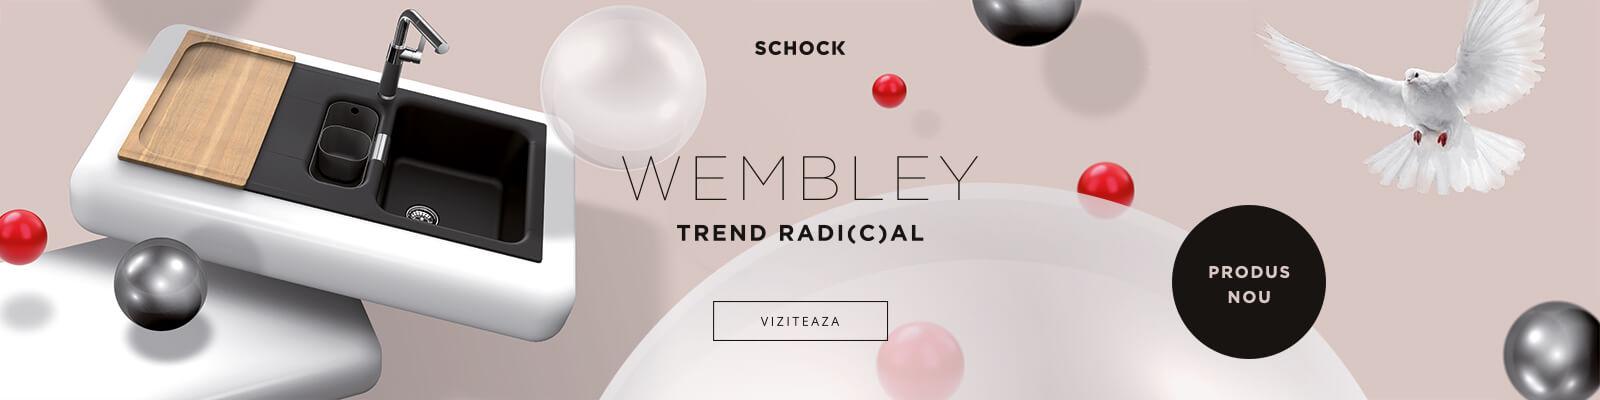 Chiuvete Bucatarie SCHOCK - Wembley